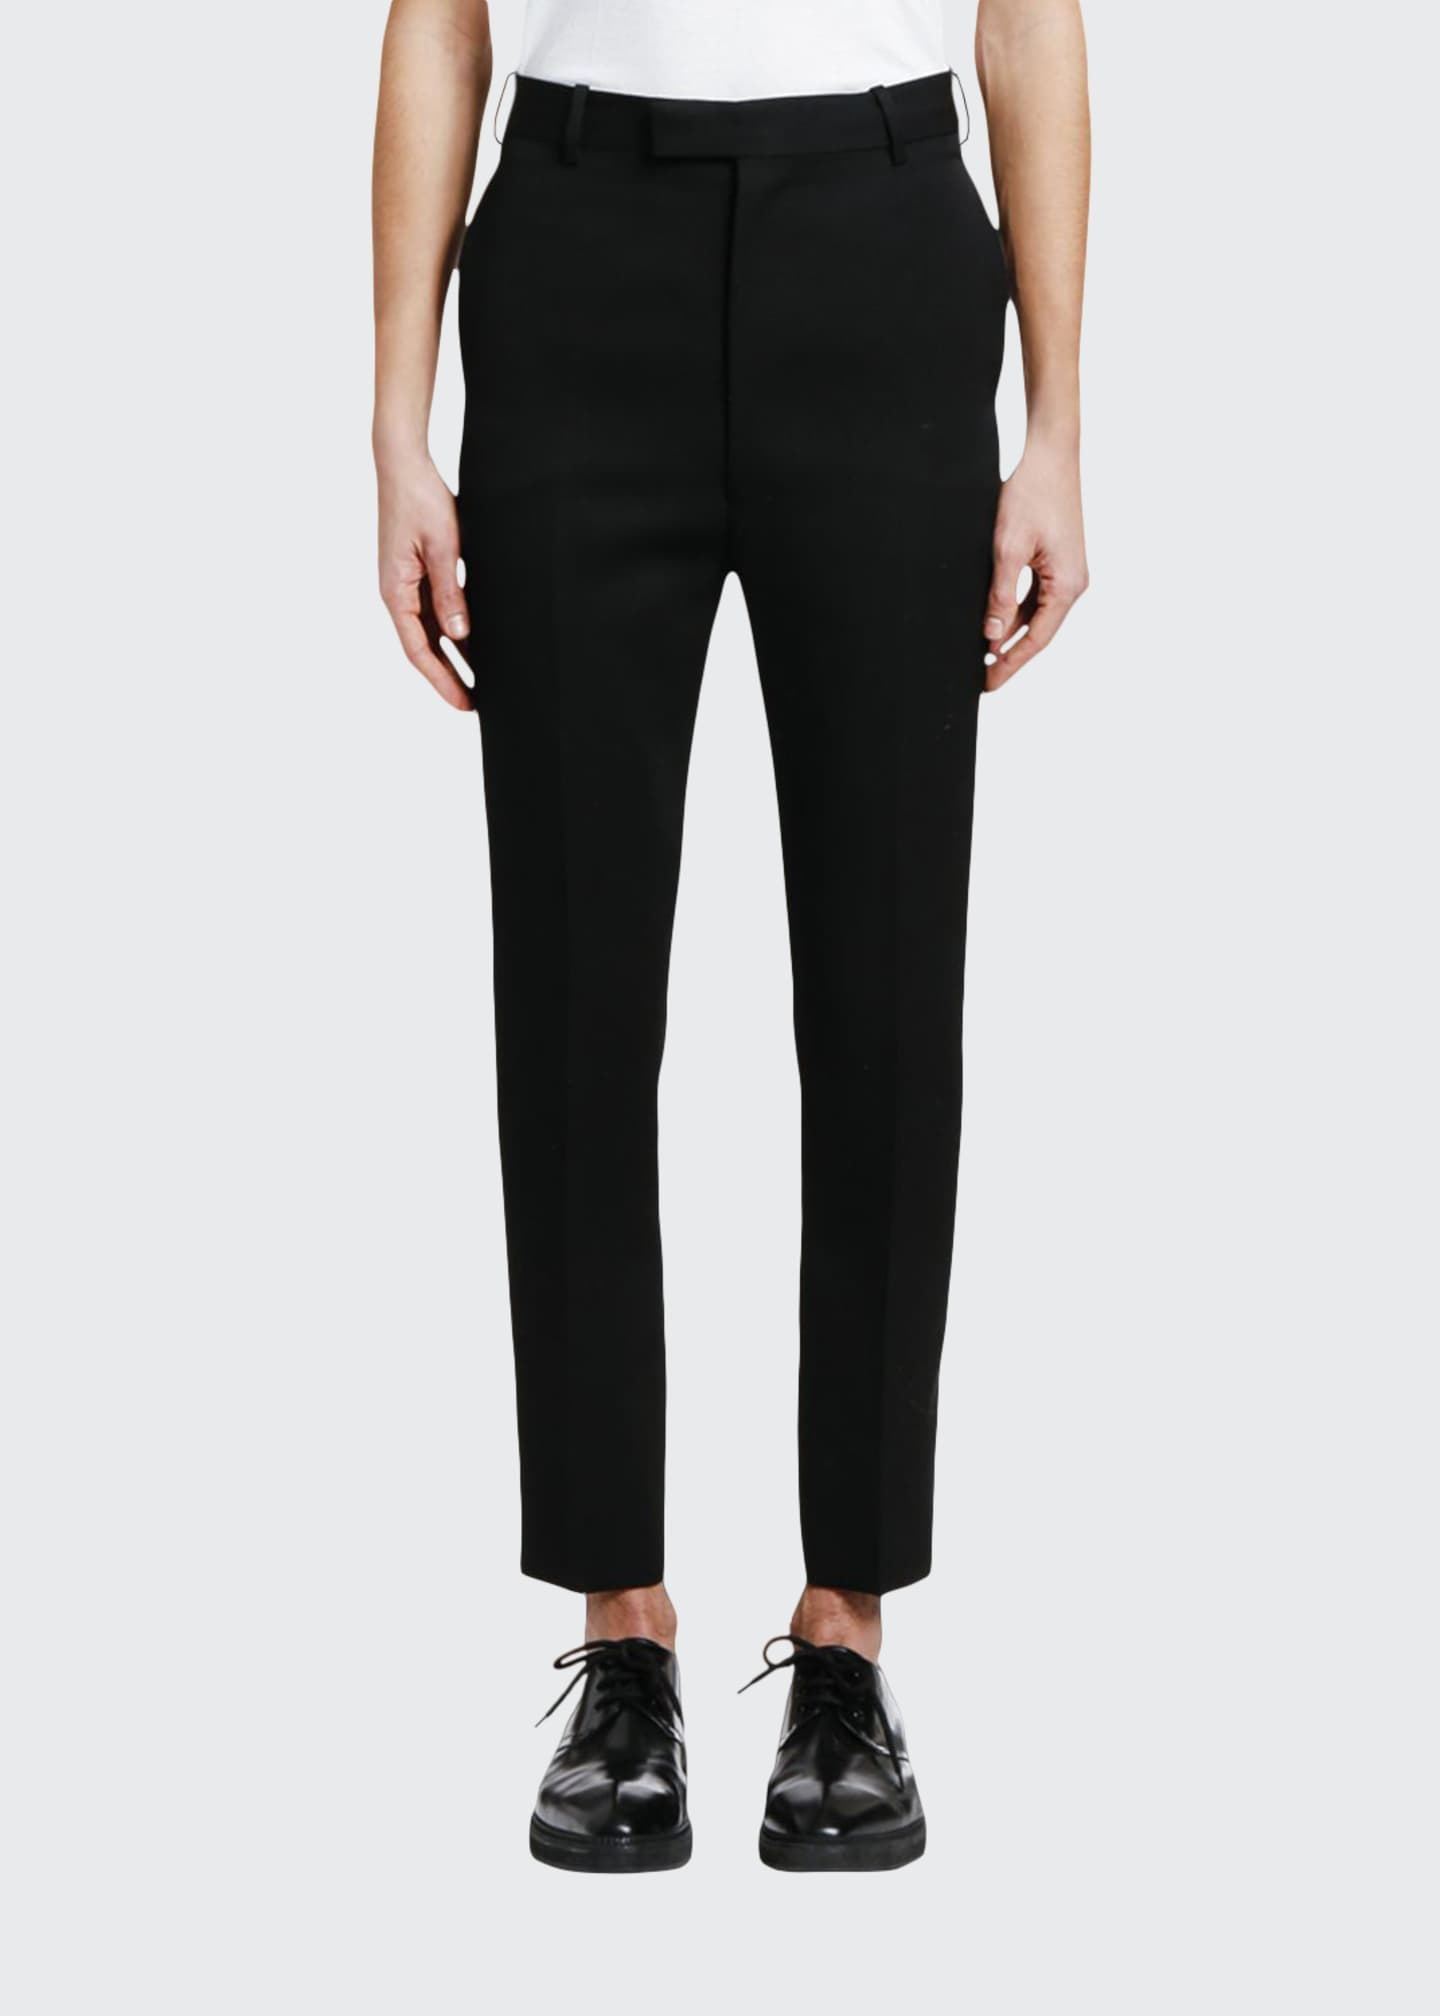 Alexander McQueen Men's Slim-Fit Wool Trousers